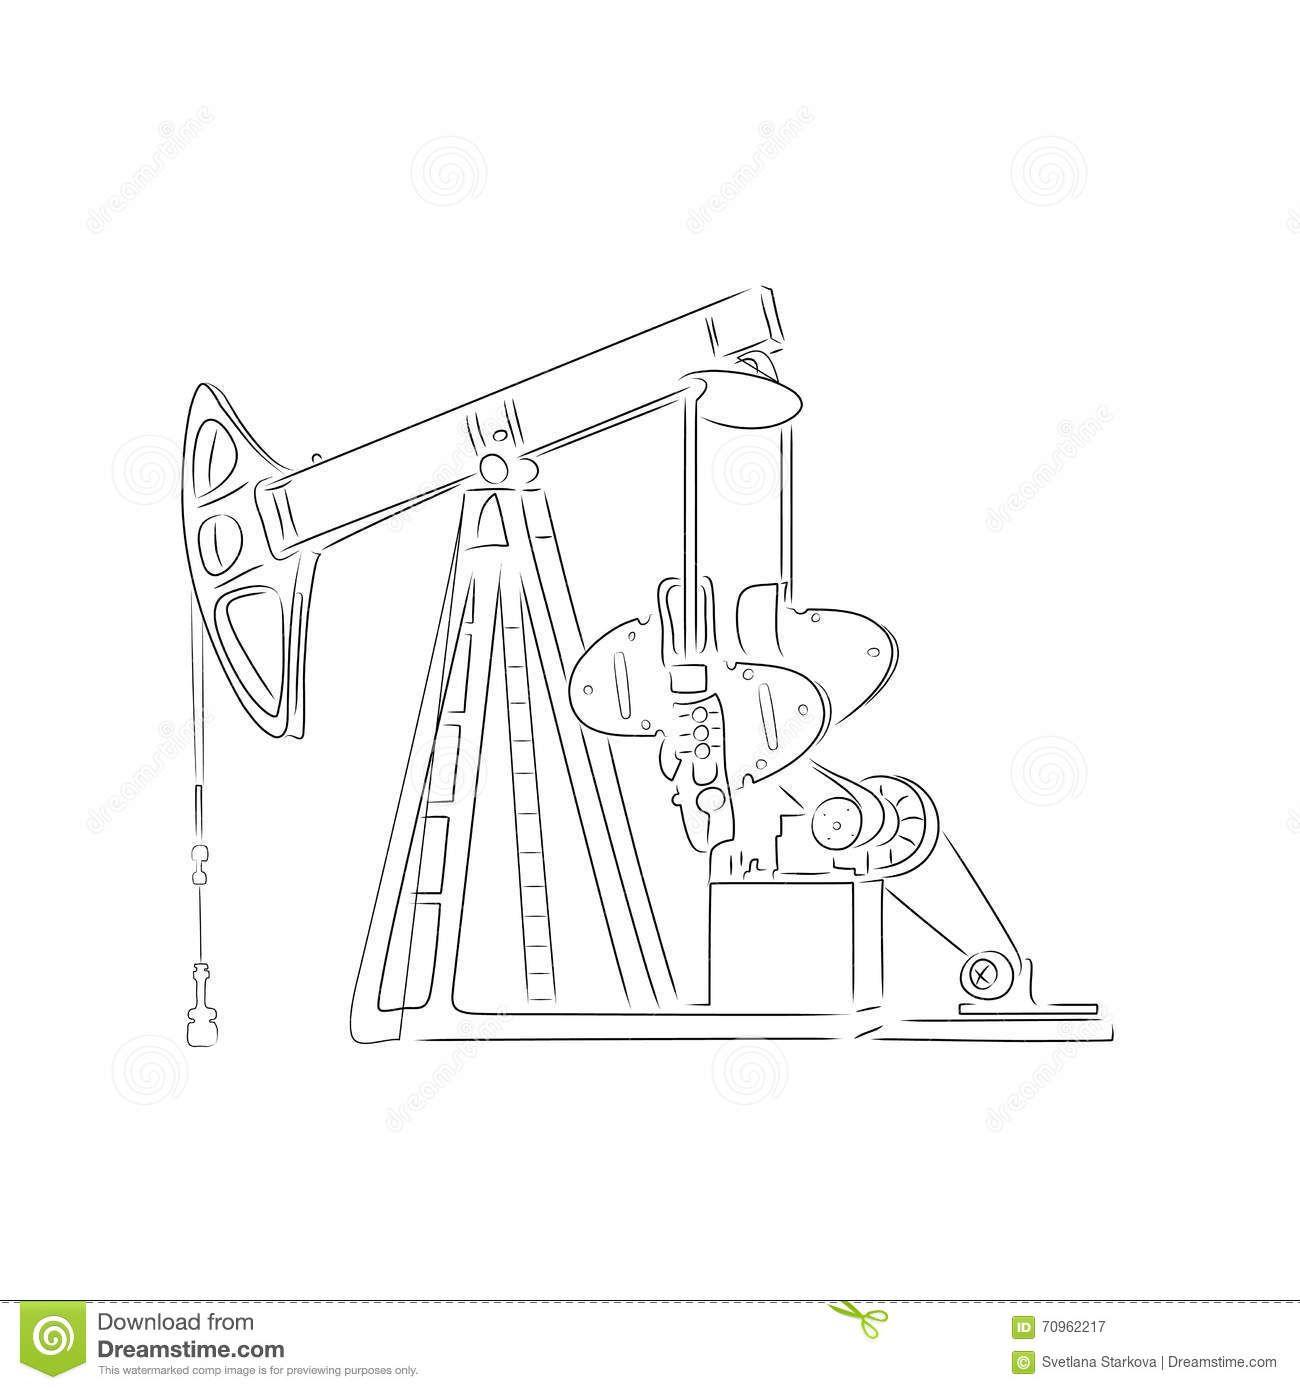 Outline Of Oil Derrick Vector